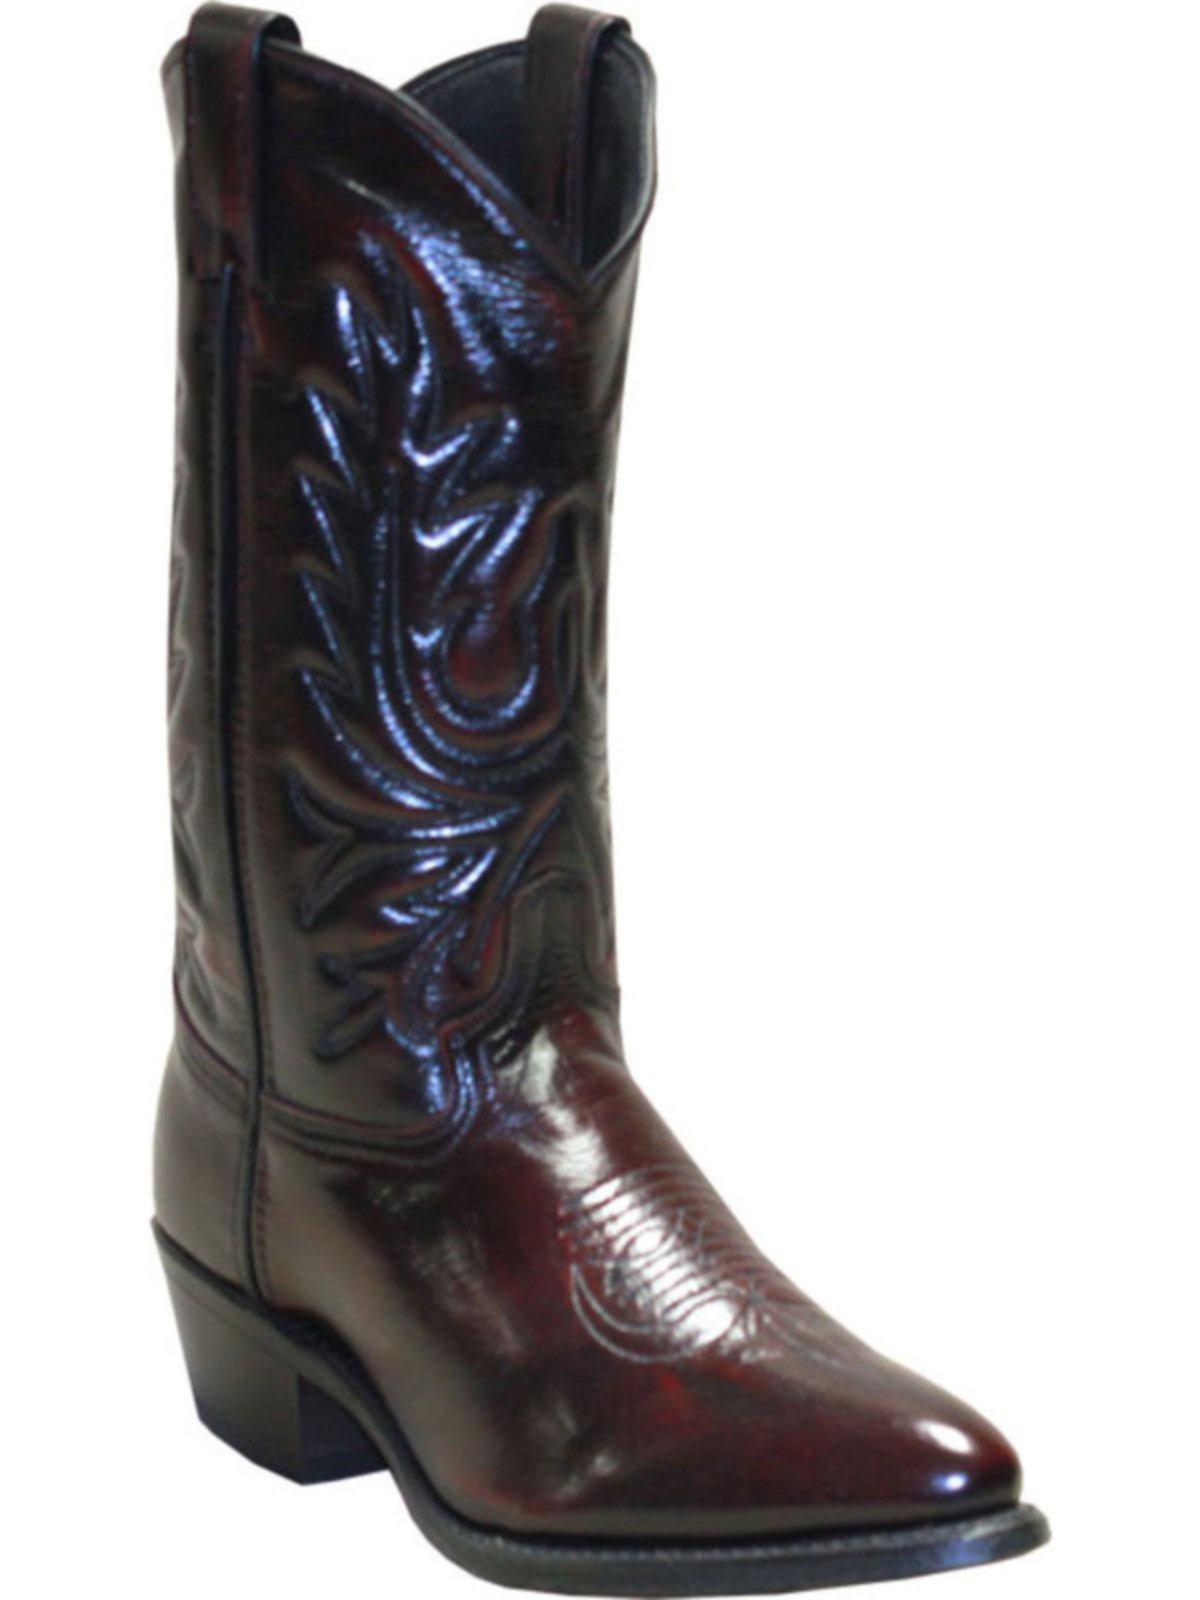 Bootamerica Abilene Mens 12 Quot Black Cherry Cowboy Boots 6461